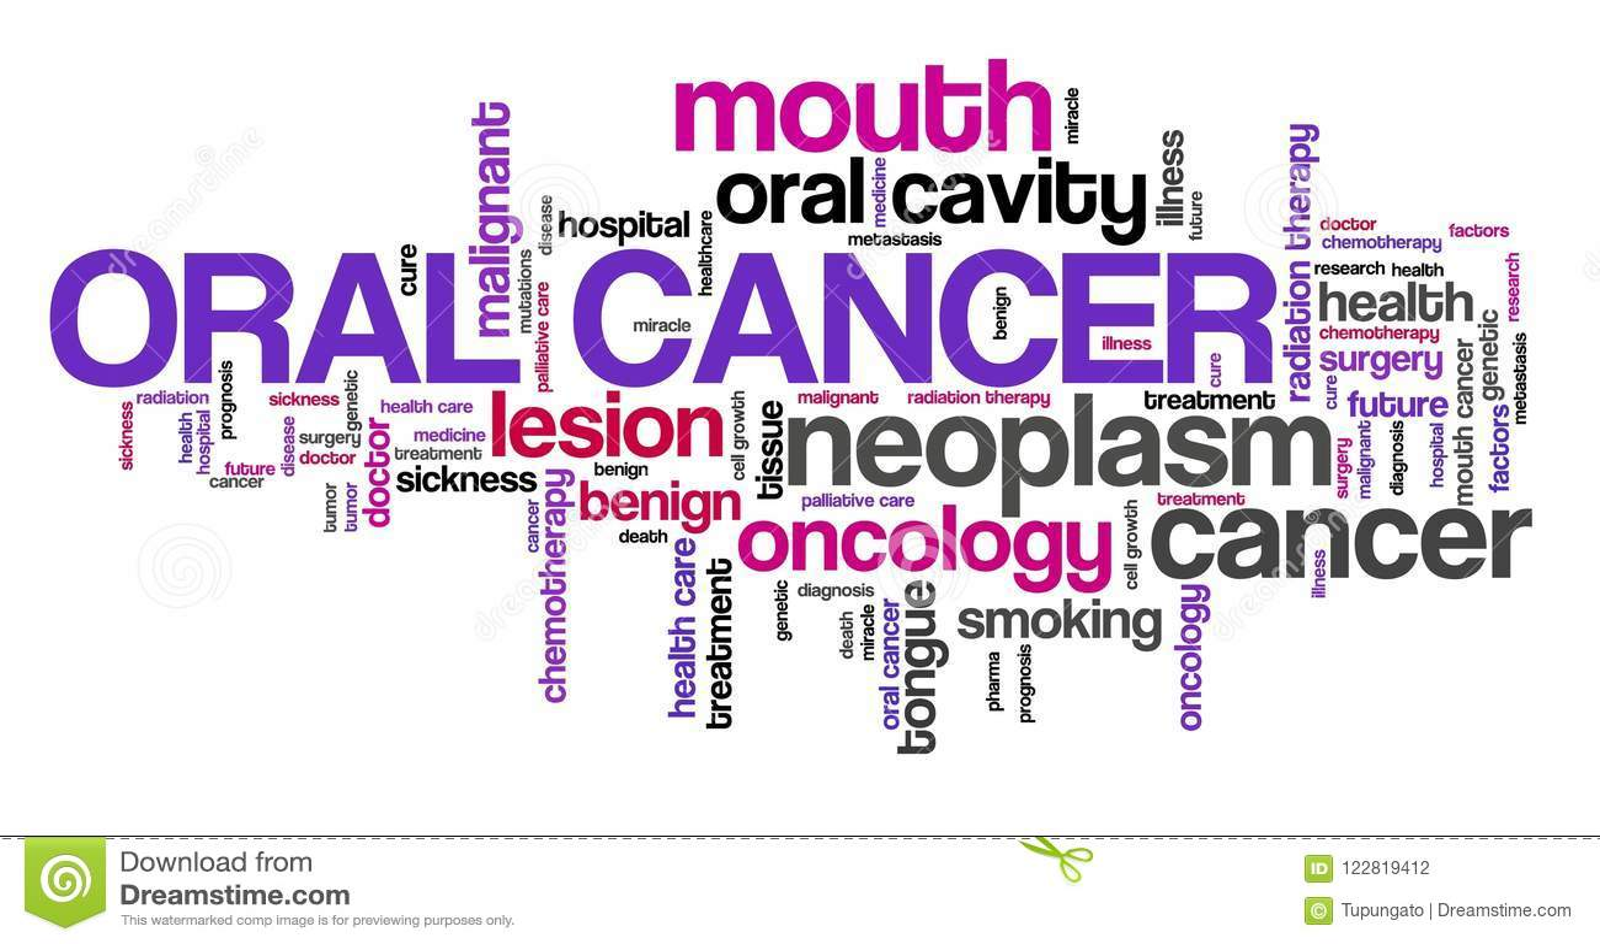 Mondelinge Kanker